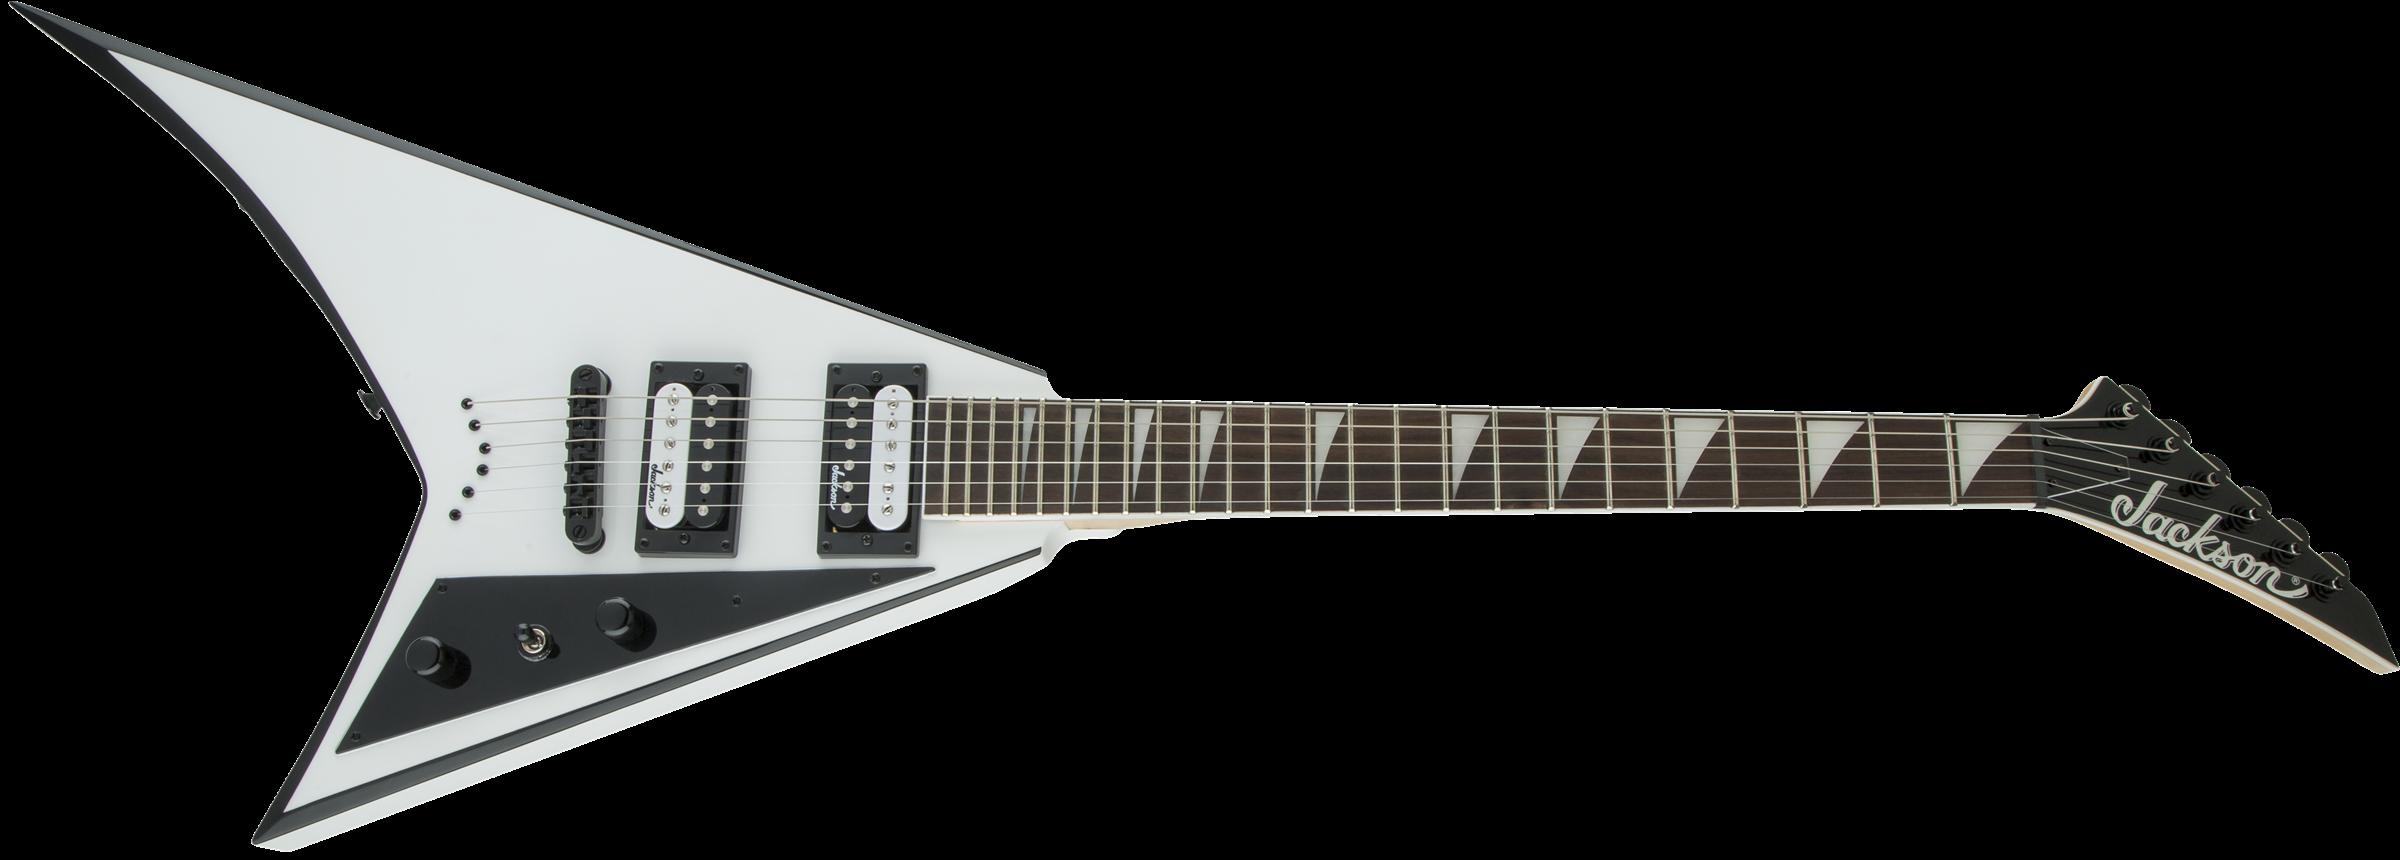 Jackson JS Series Rhoads JS32T, Amaranth Fingerboard, White with Black Bevels